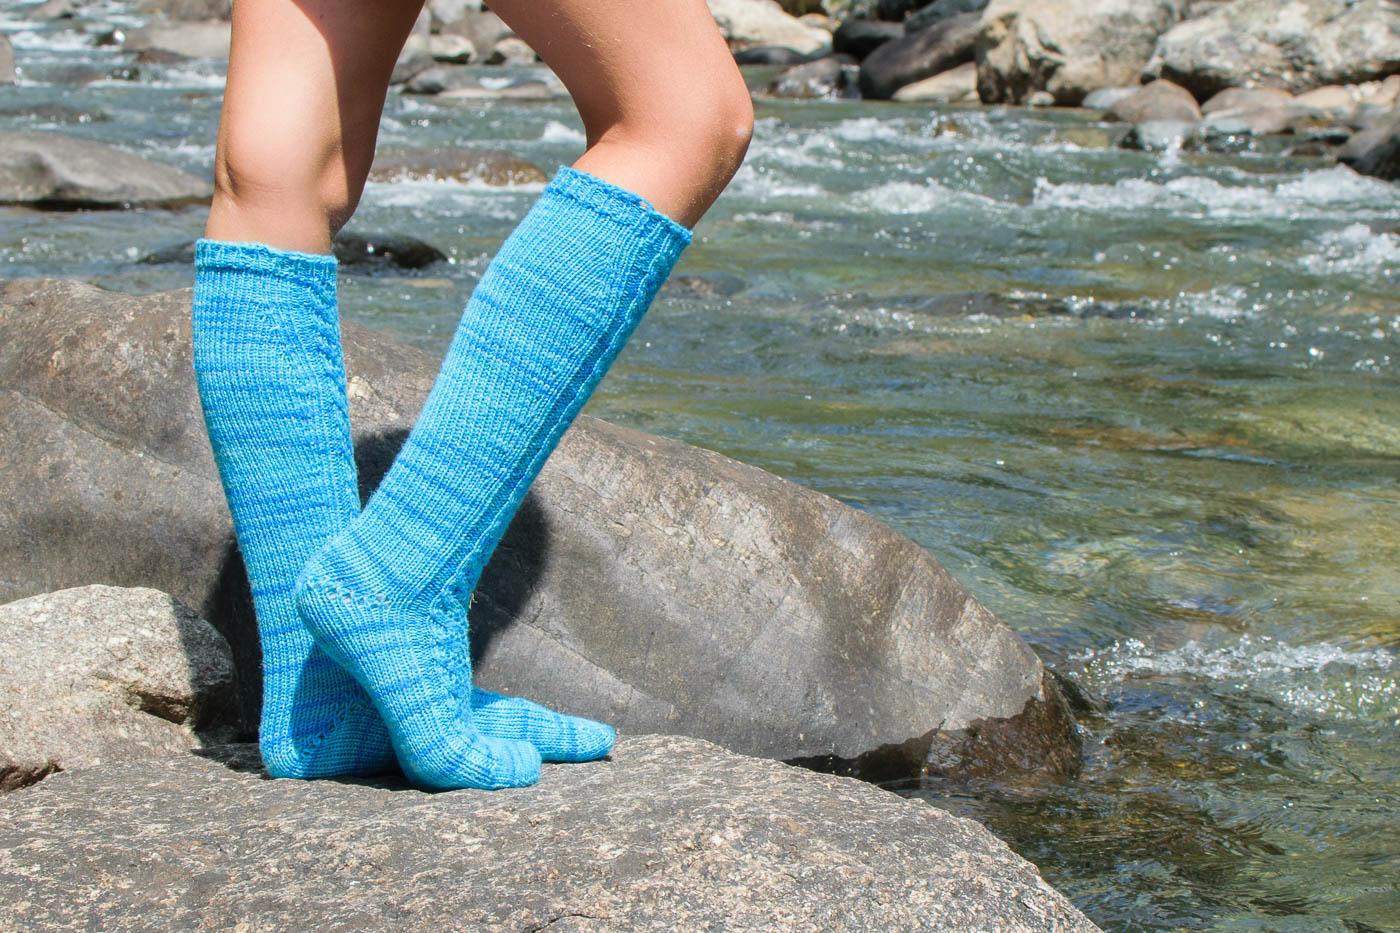 The Skola Socks knitting pattern